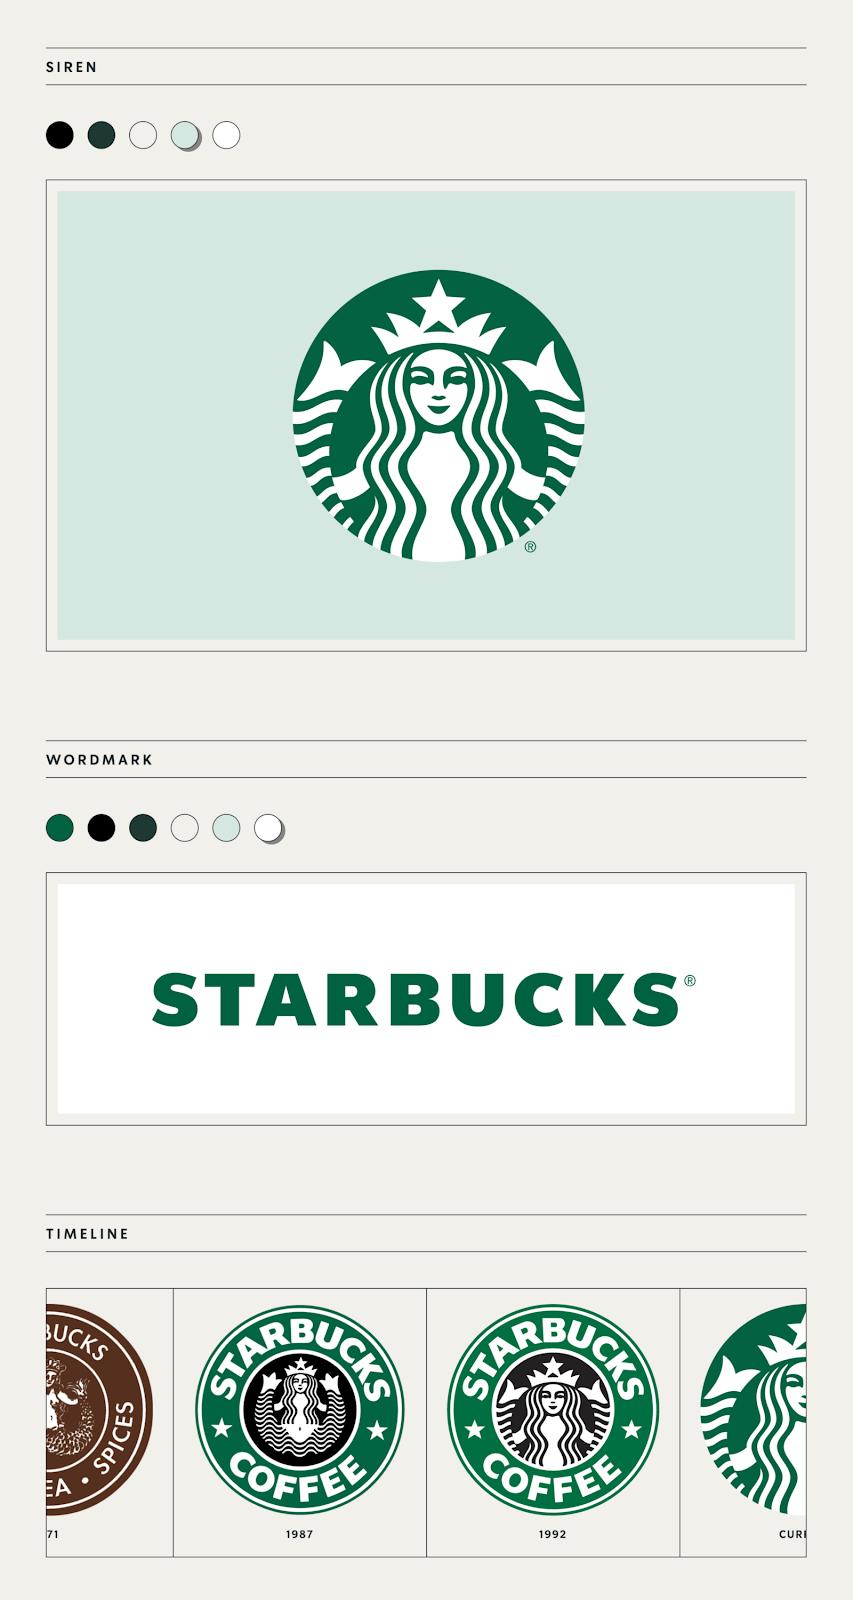 Starbucks brand guidelines (creative.starbucks.com)